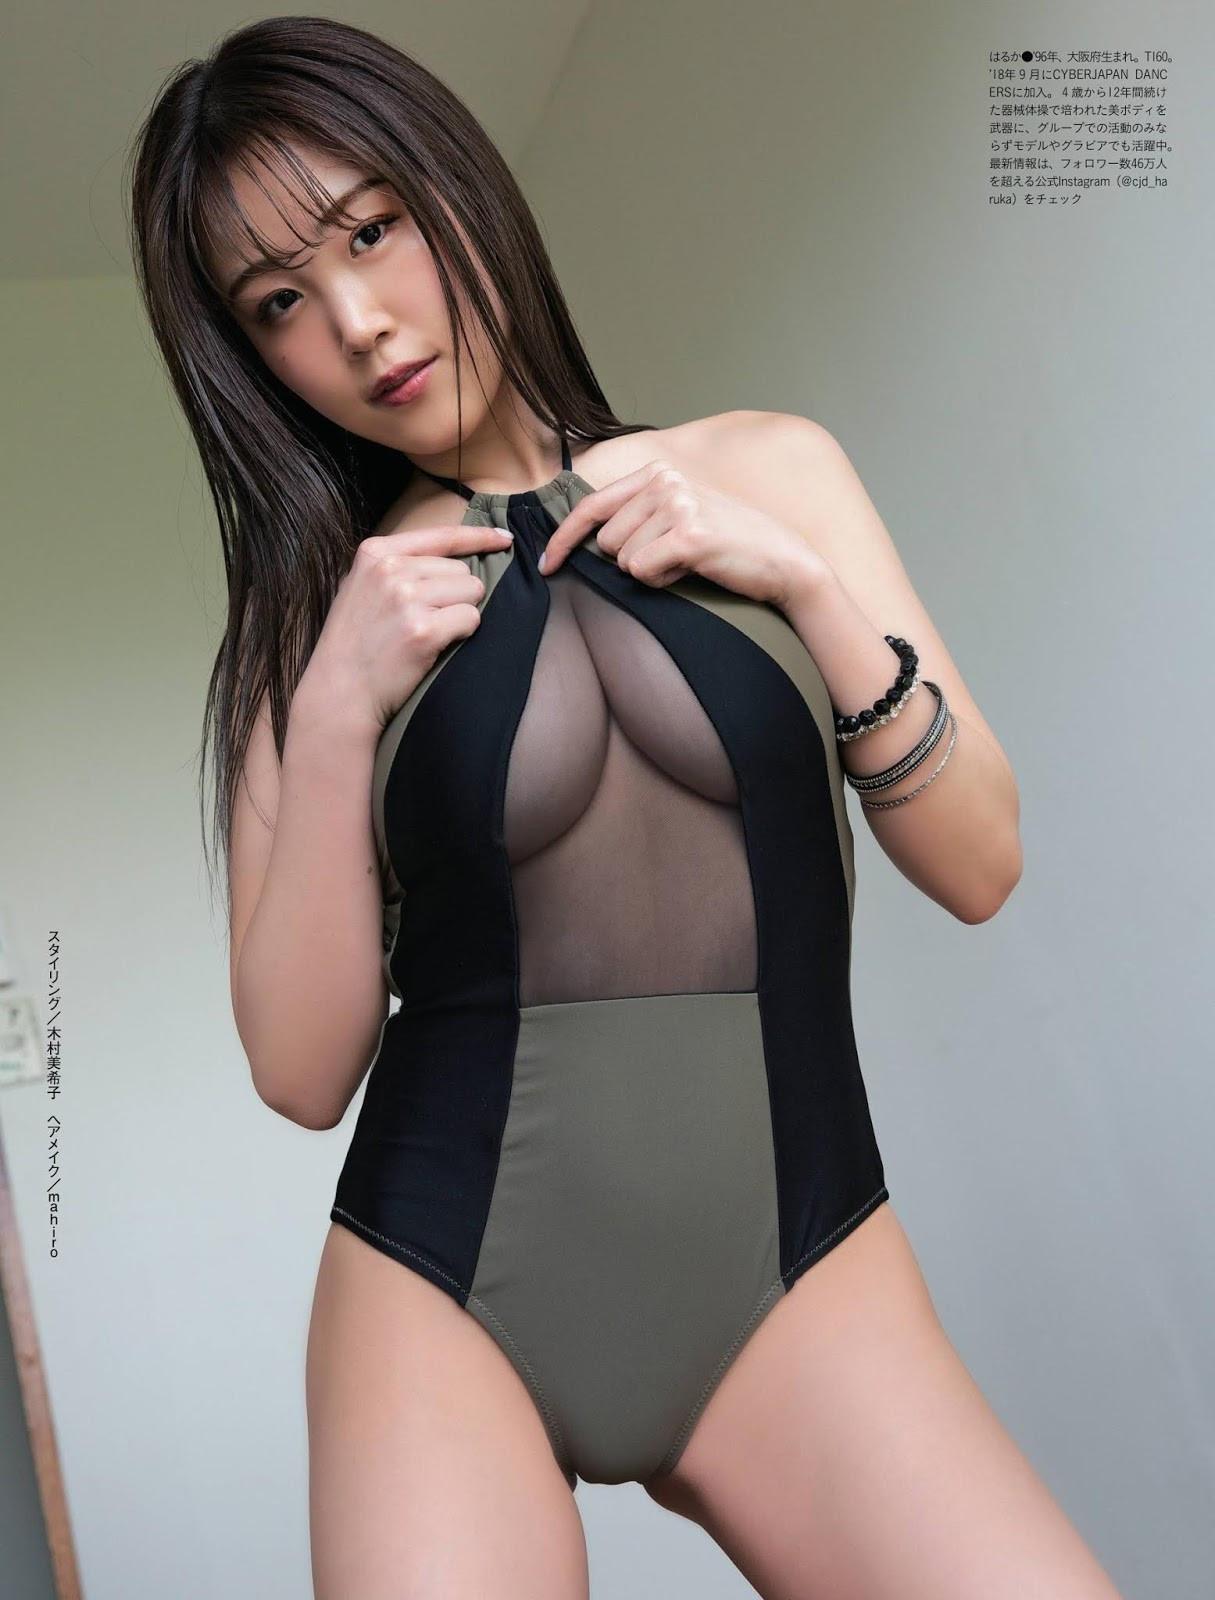 Cyber-Japan-Dancers-Haruka-014